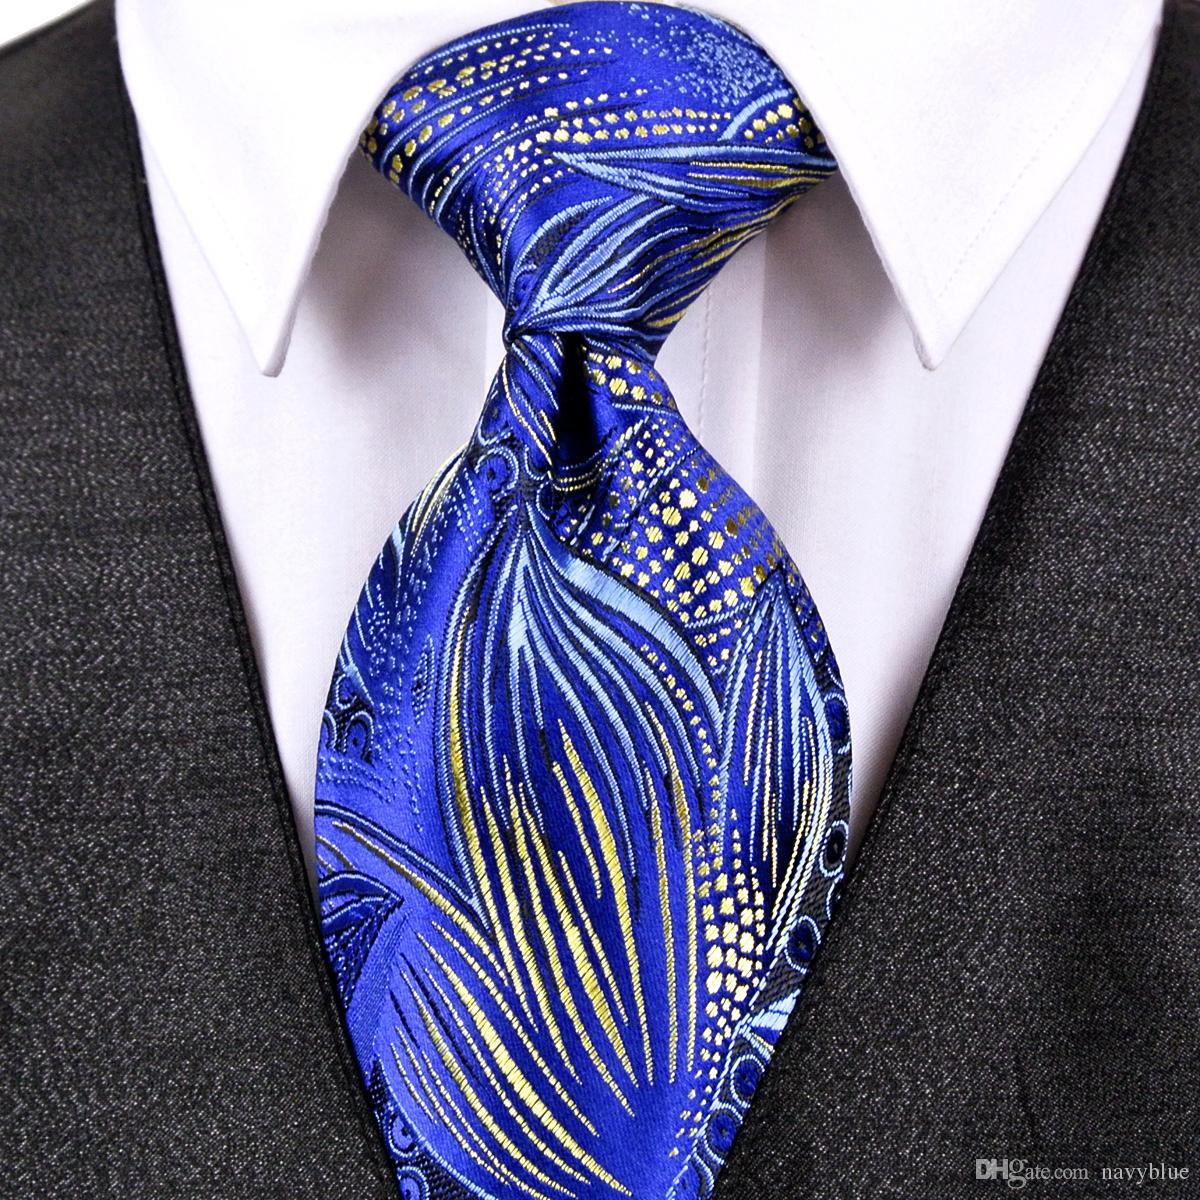 Handgemachte J22 Blumenmuster Royal Blue Gelb Mens Ties Krawatten 100% Seide Jacquard Woven Fashion Kostenloser Versand Großhandel